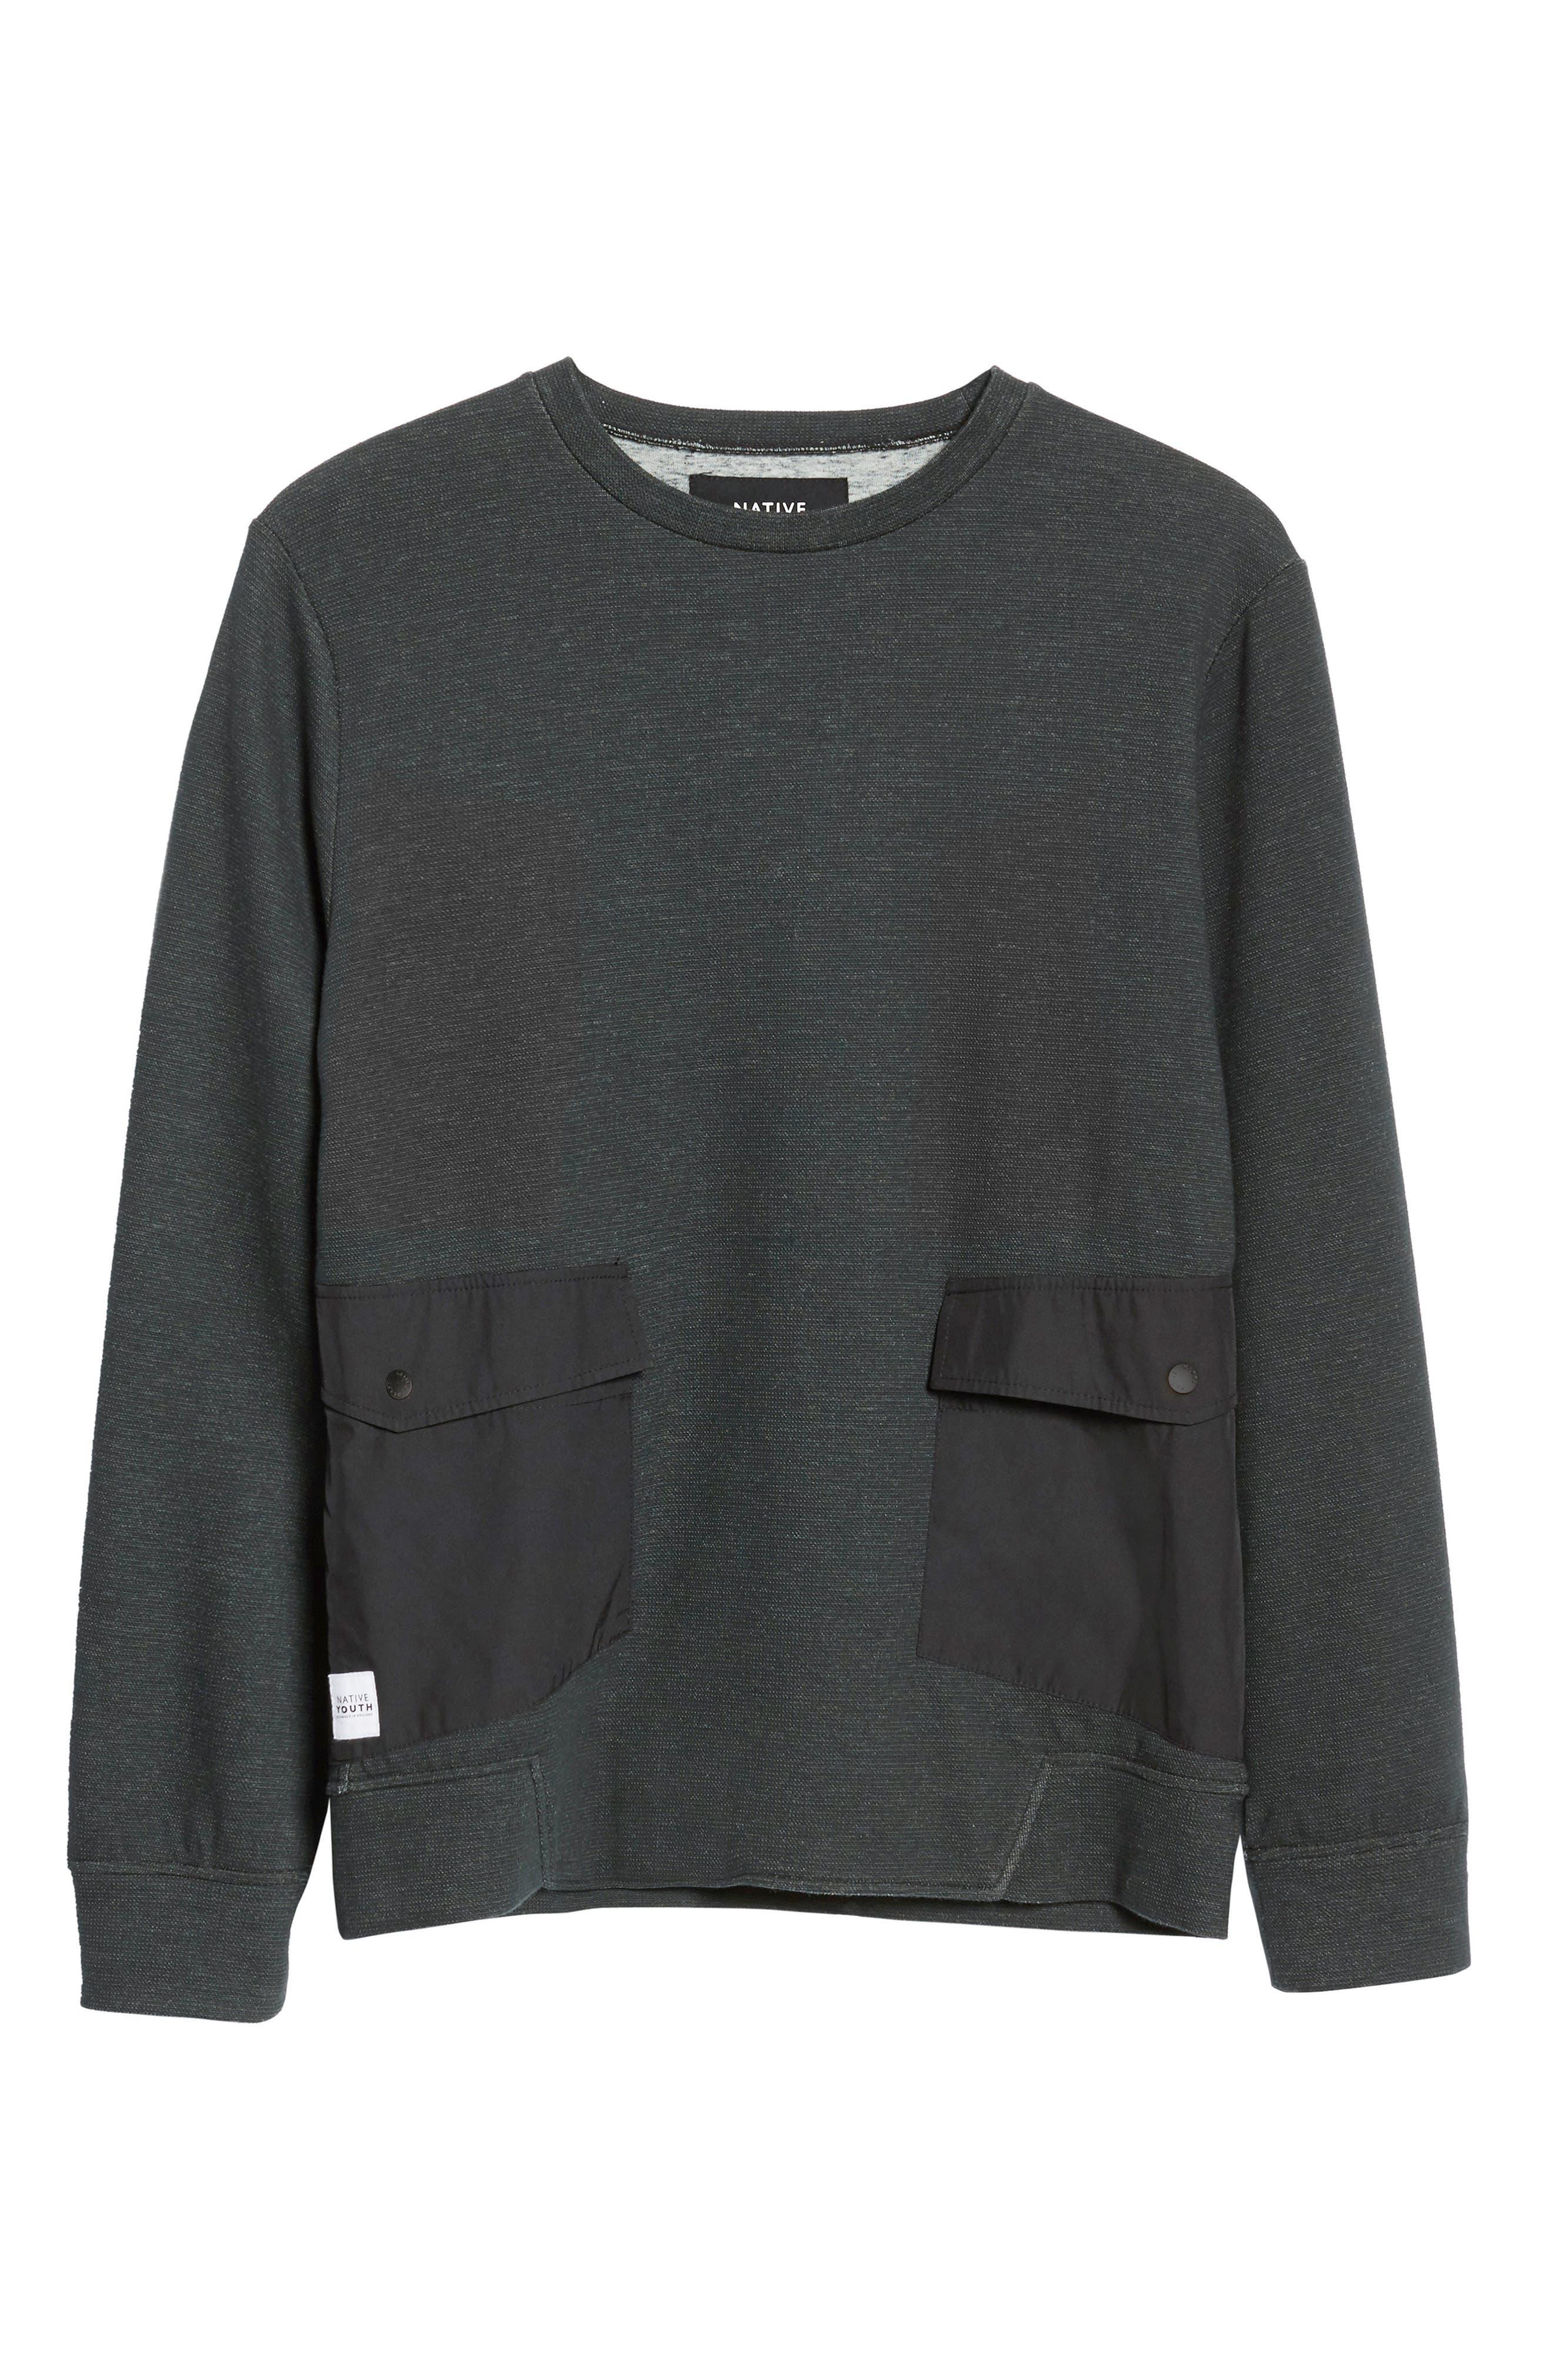 Oracle Sweatshirt,                             Alternate thumbnail 6, color,                             300